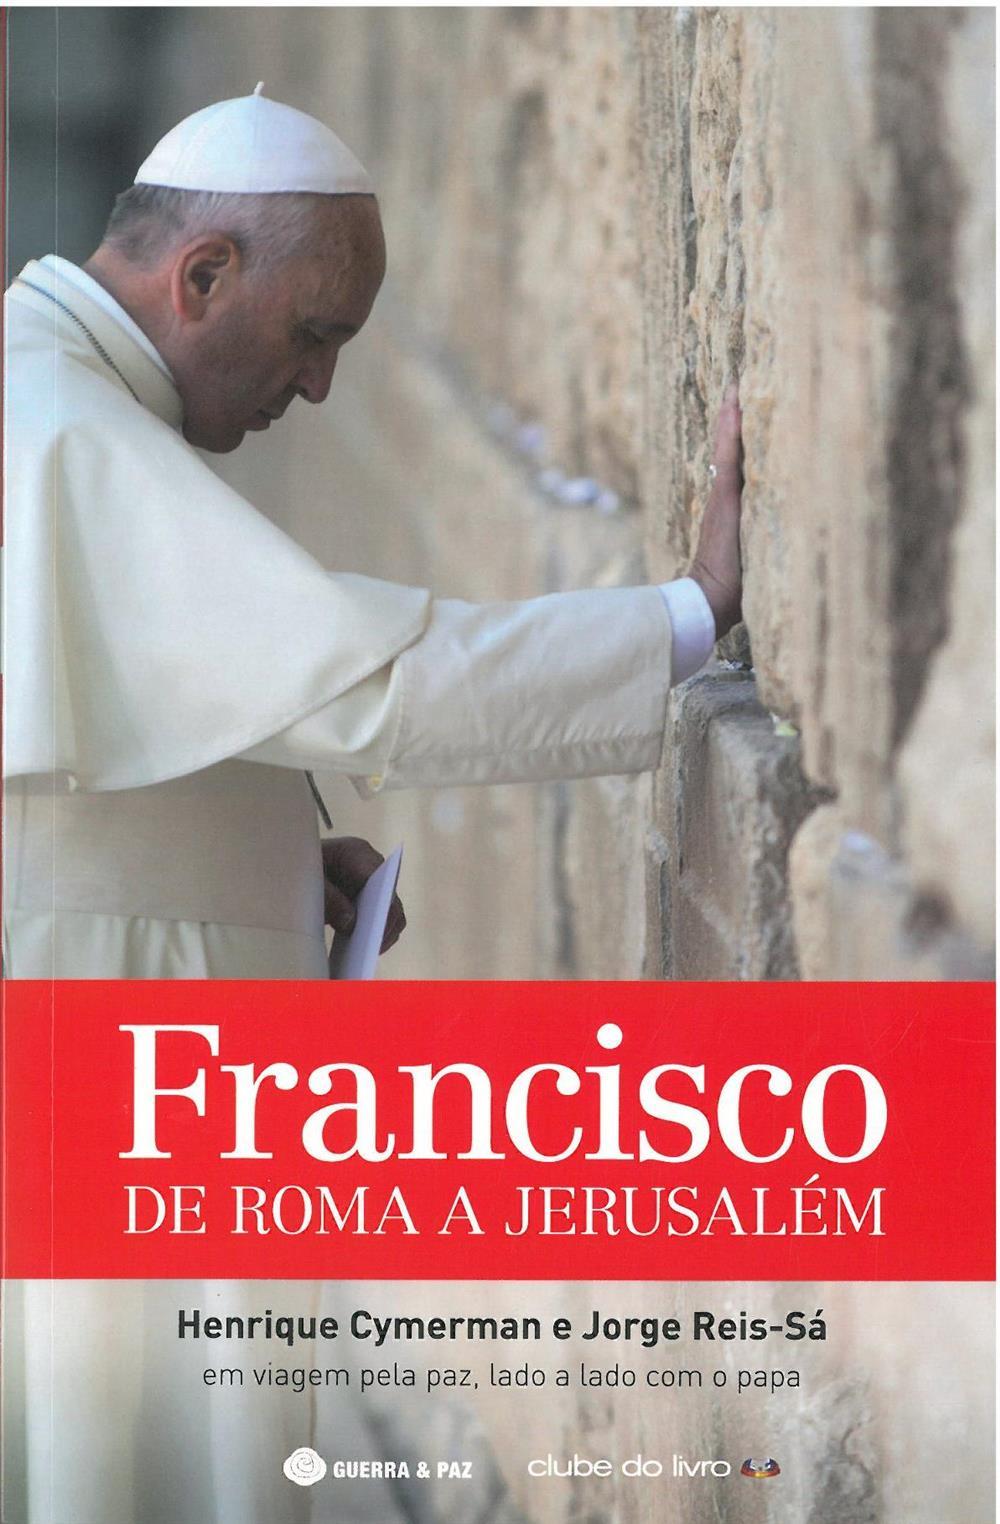 Francisco_ de Roma a Jerusalém_.jpg